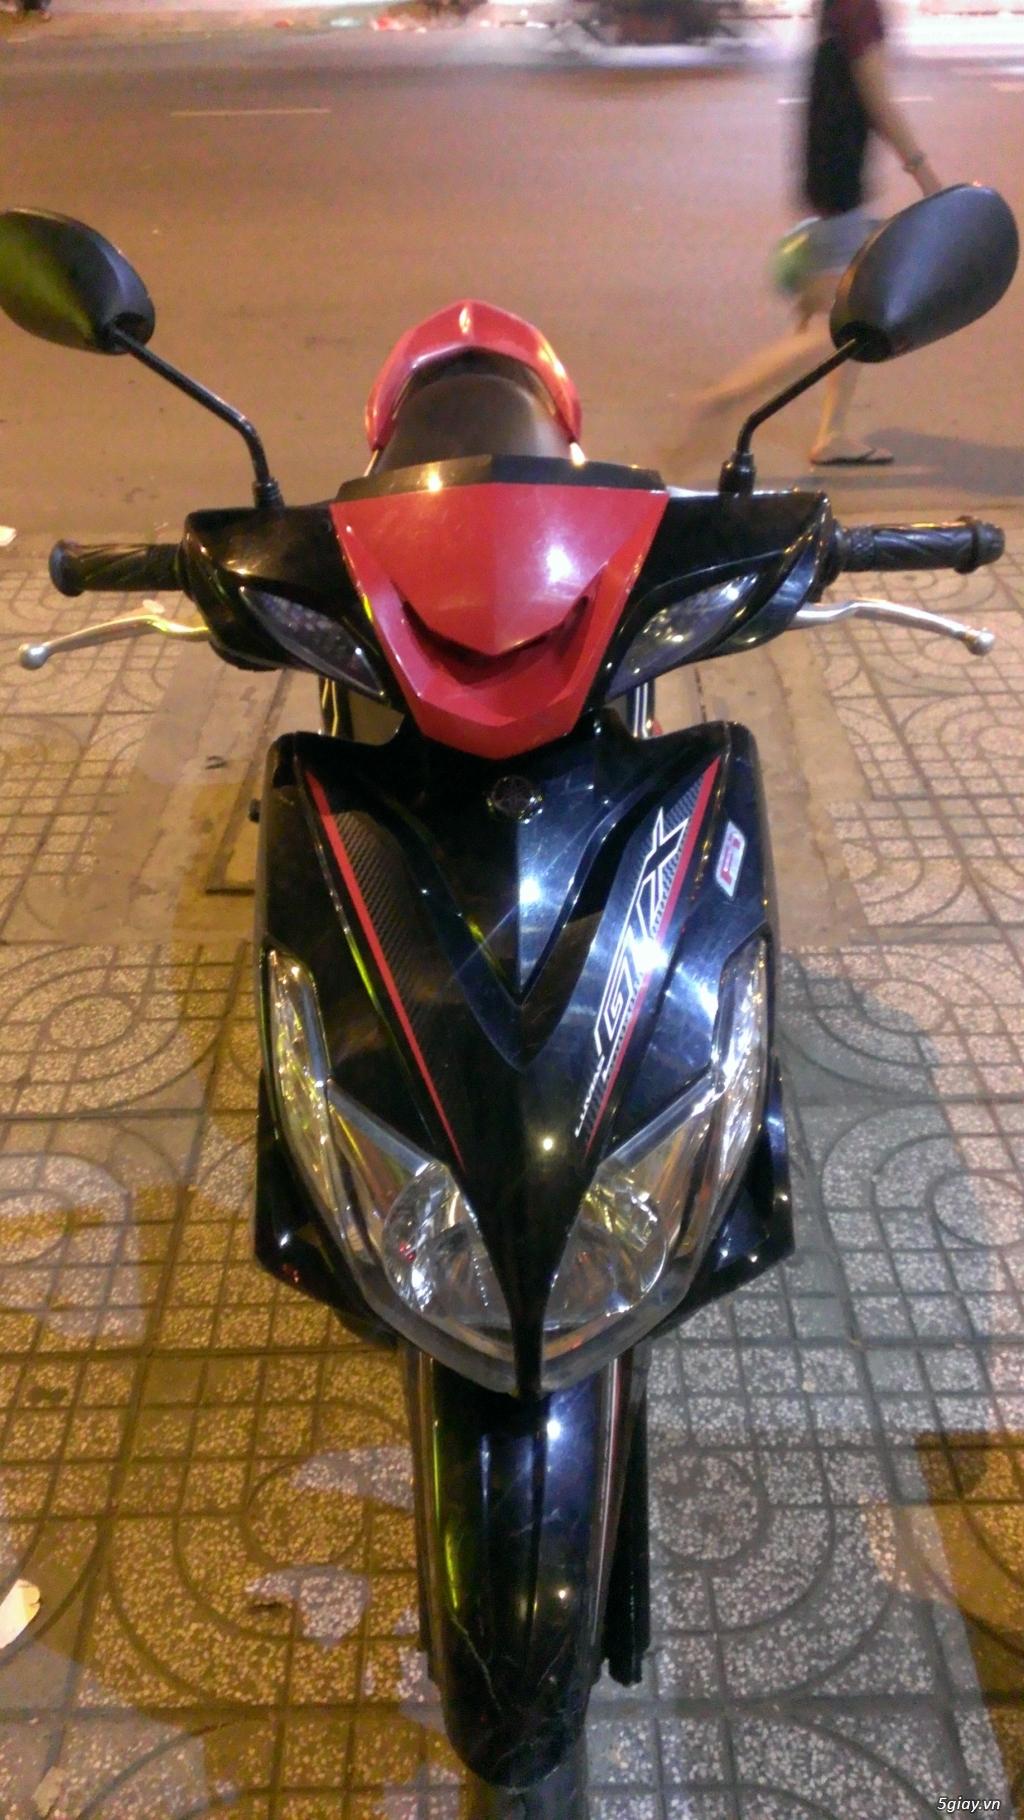 Yamaha Luvias Fi Bien so 64 Vinh Long - 1